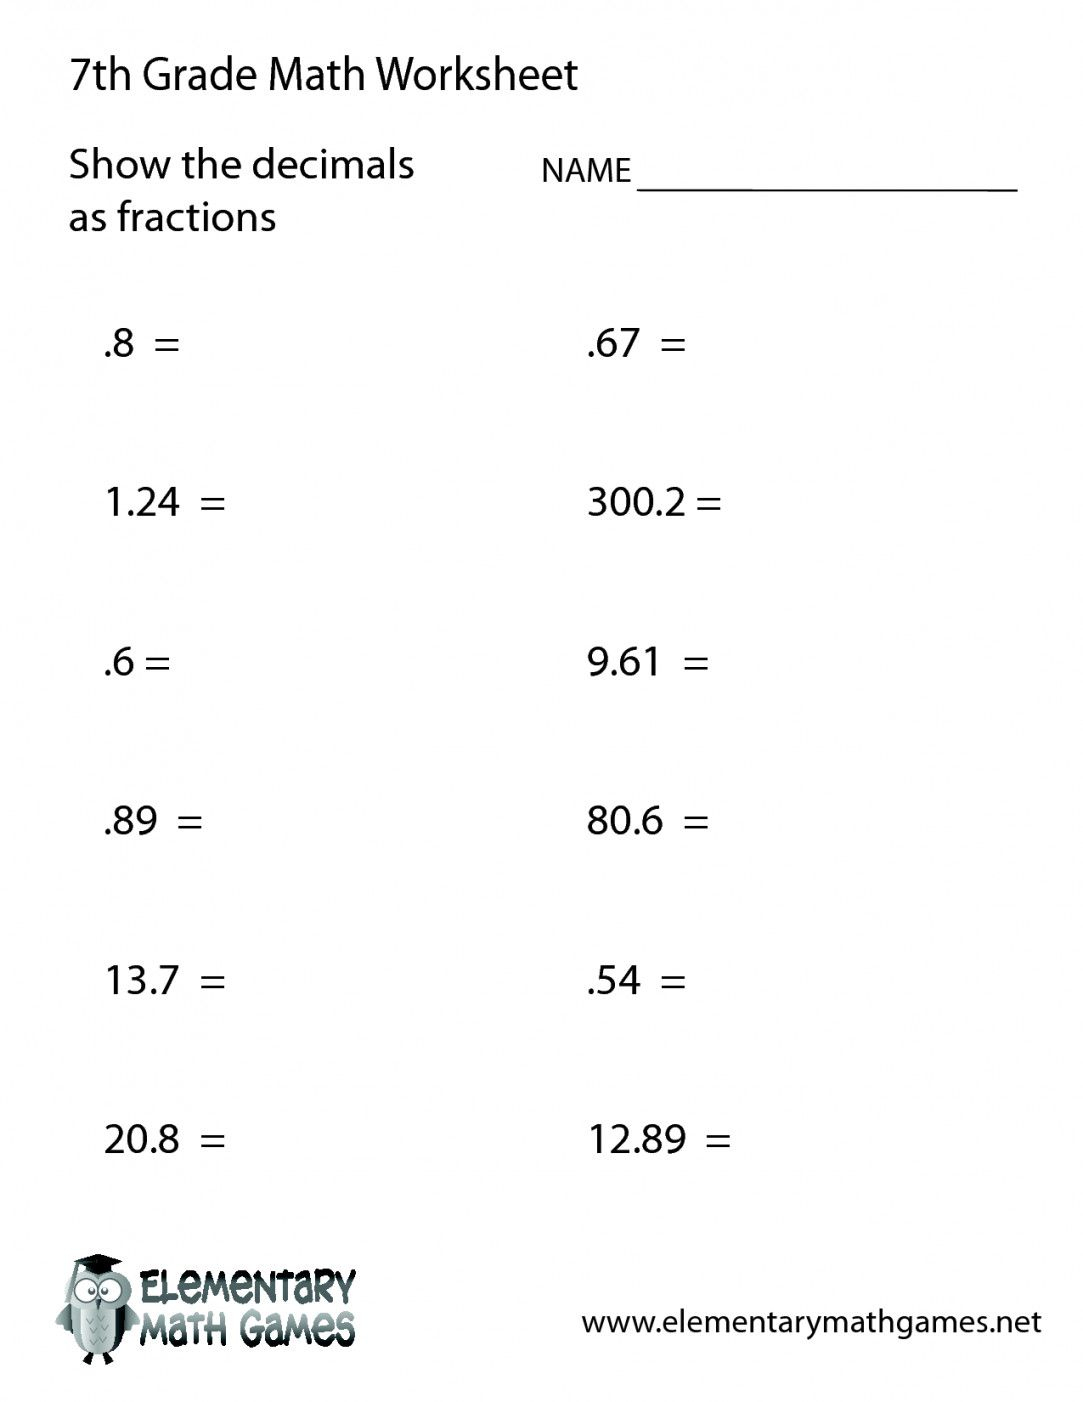 Free Printable 7Th Grade Math Worksheets | Lostranquillos - Free Printable 7Th Grade Math Worksheets